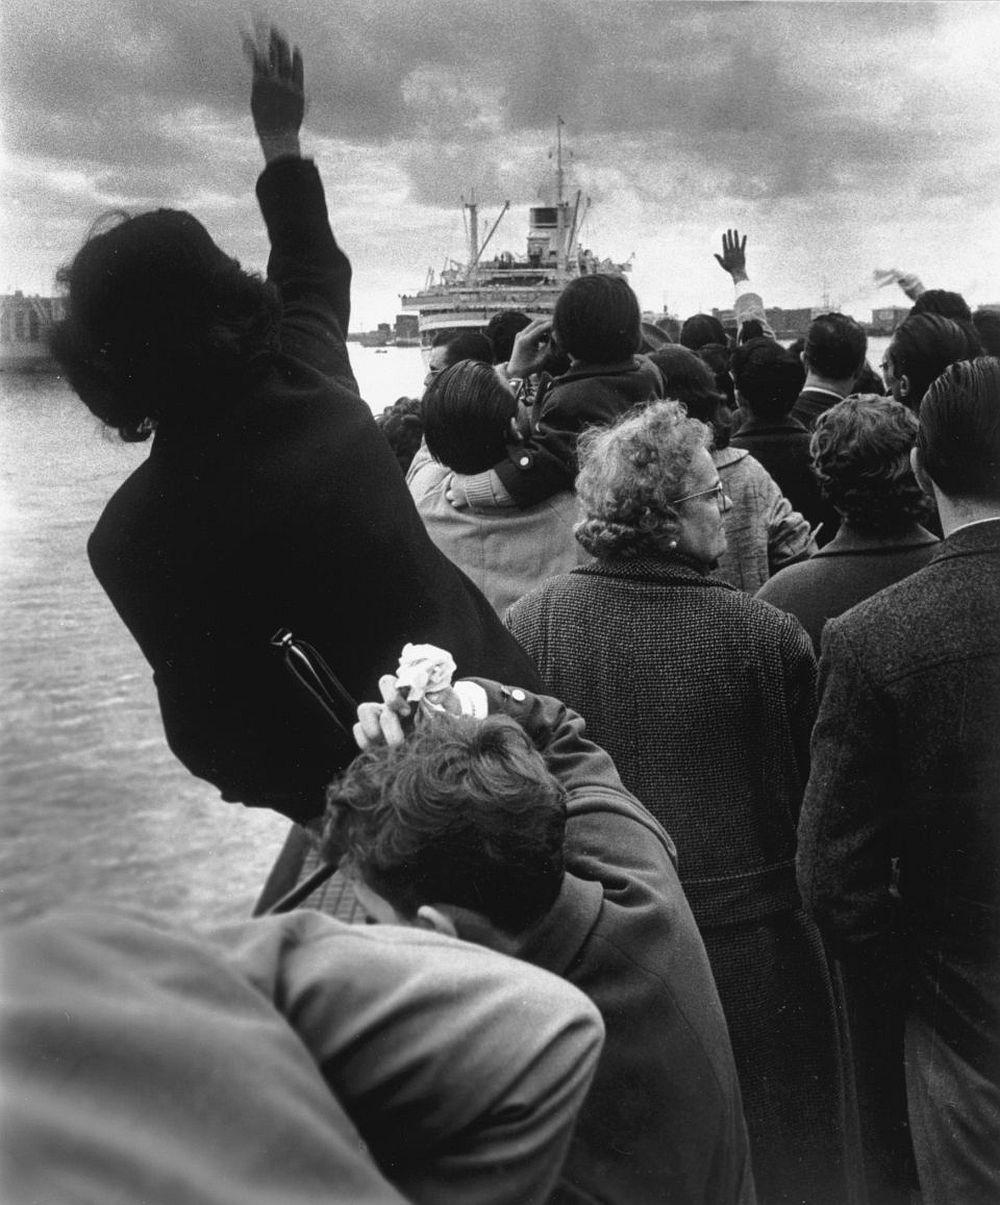 Stefano Robino, Seeing off the Cristoforo Colombo, Genoa, 1959 © Stefano Robino